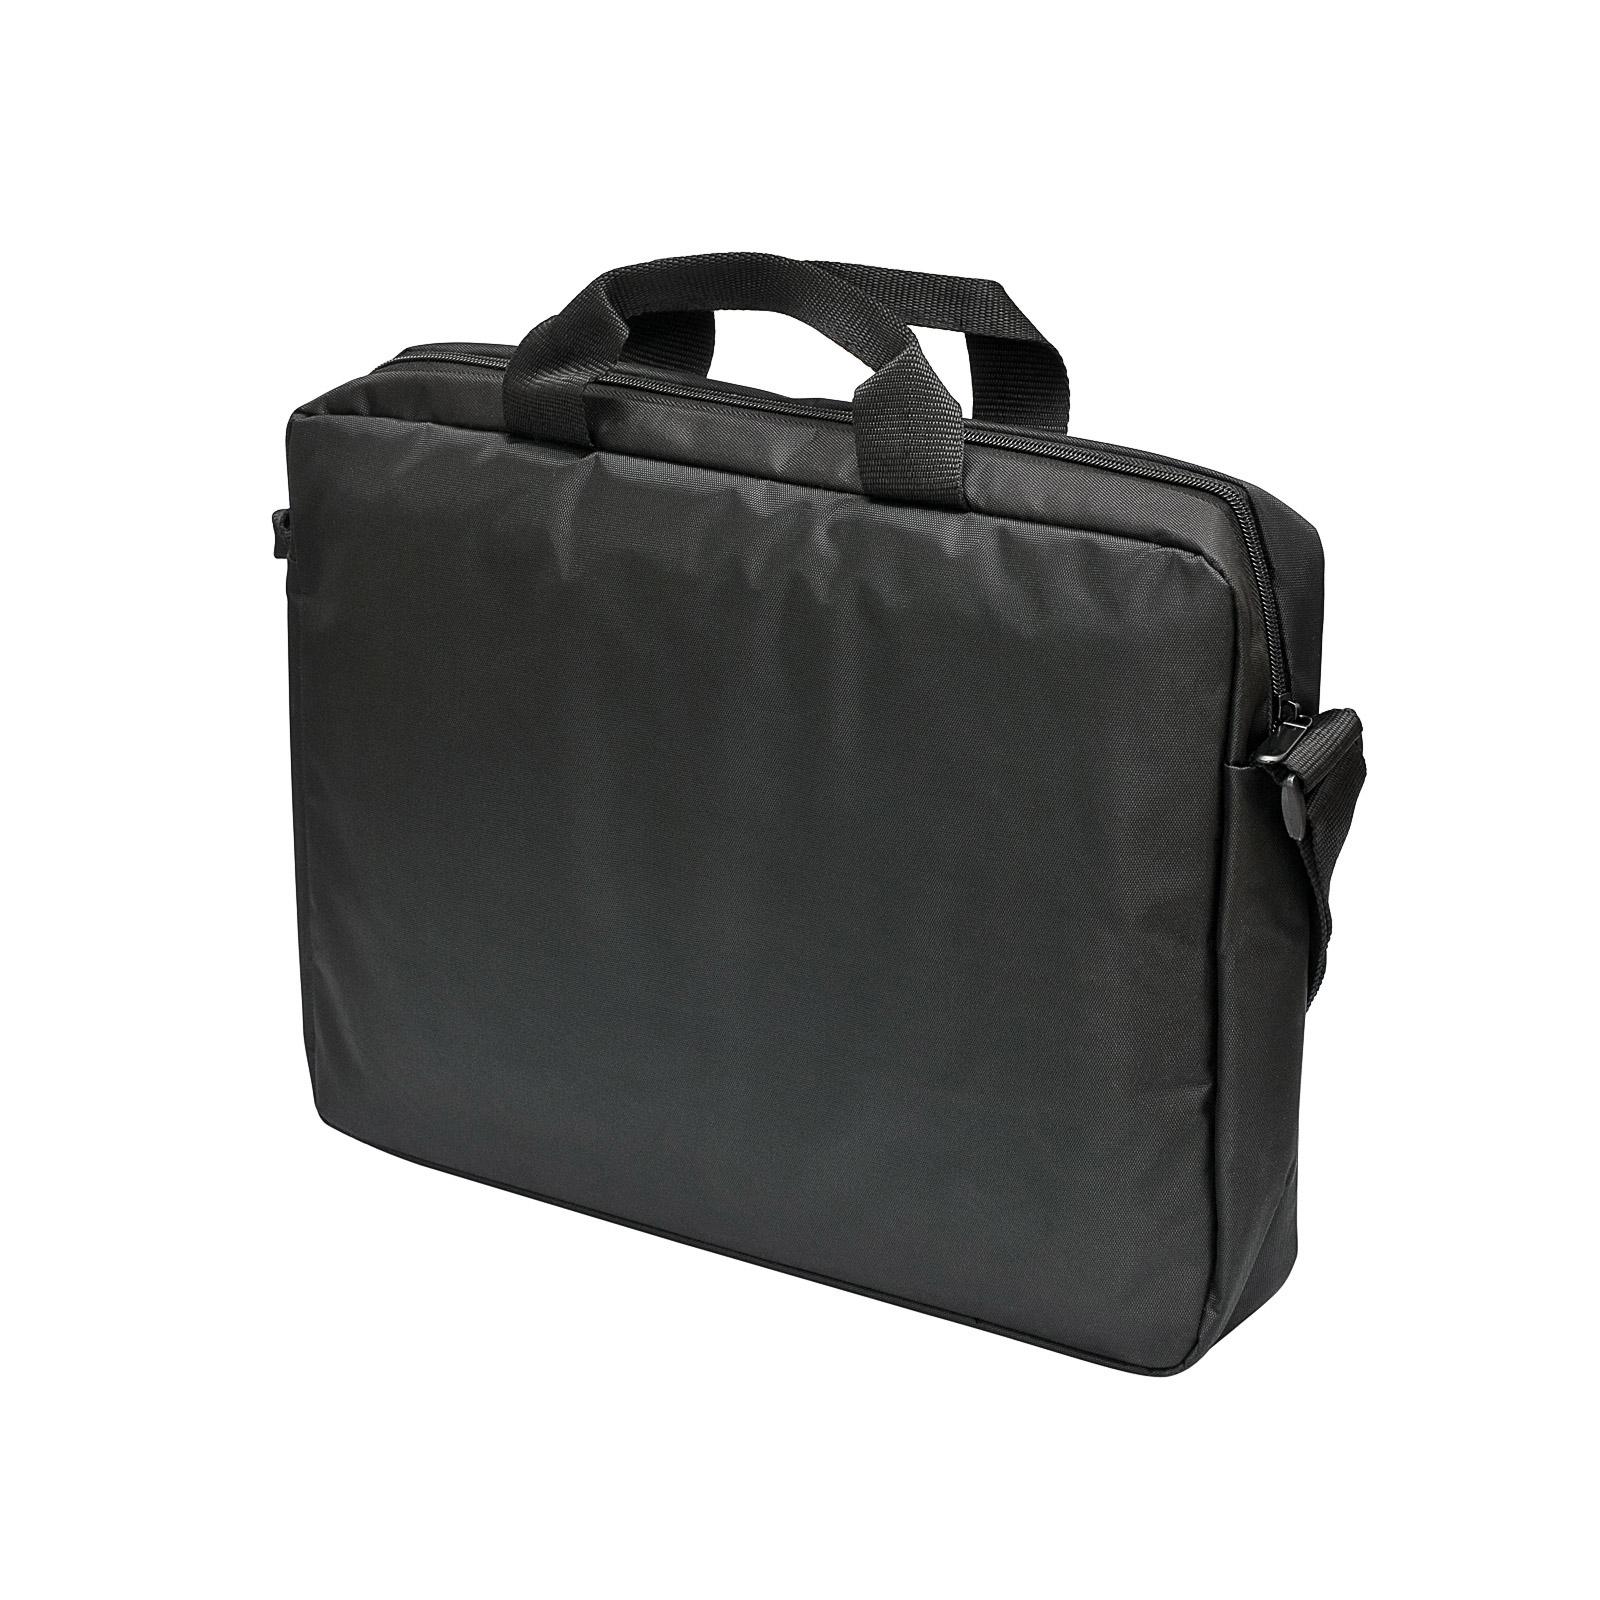 Сумка для ноутбука Grand-X 15.6'' Black (SB-120) изображение 3